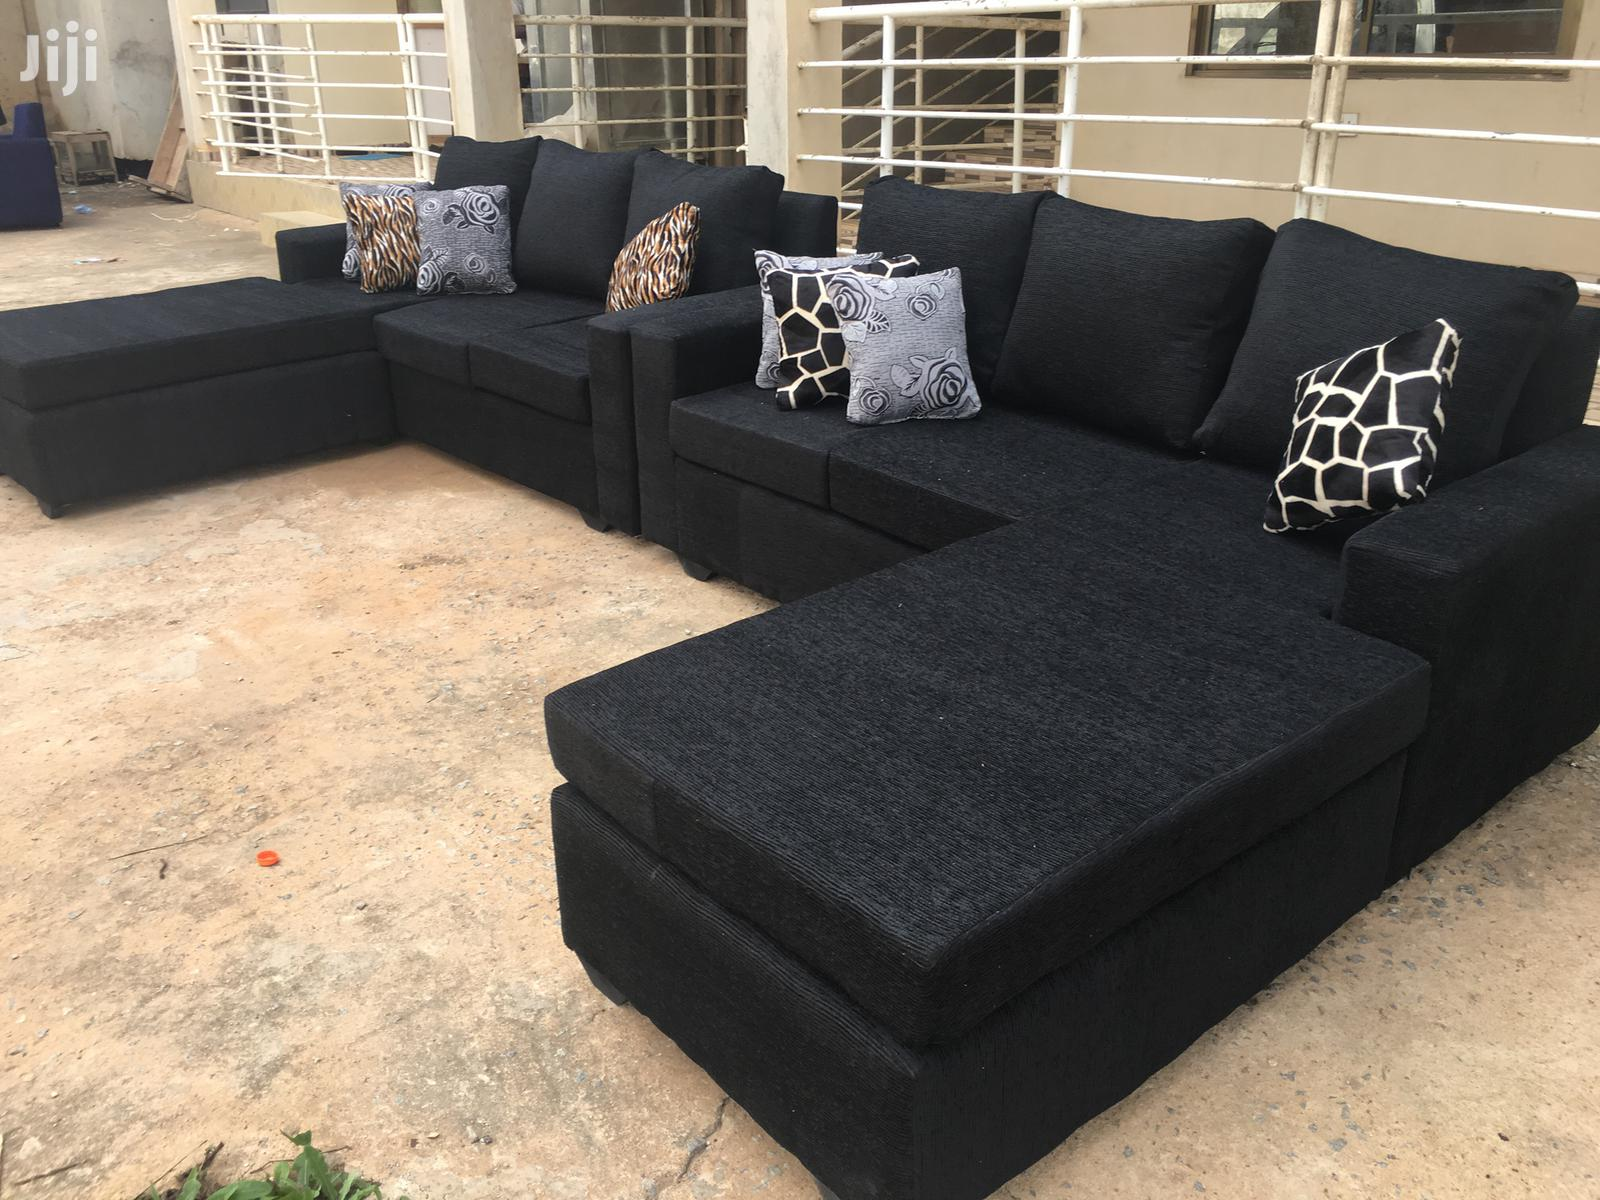 Italian Sofa Set ❤